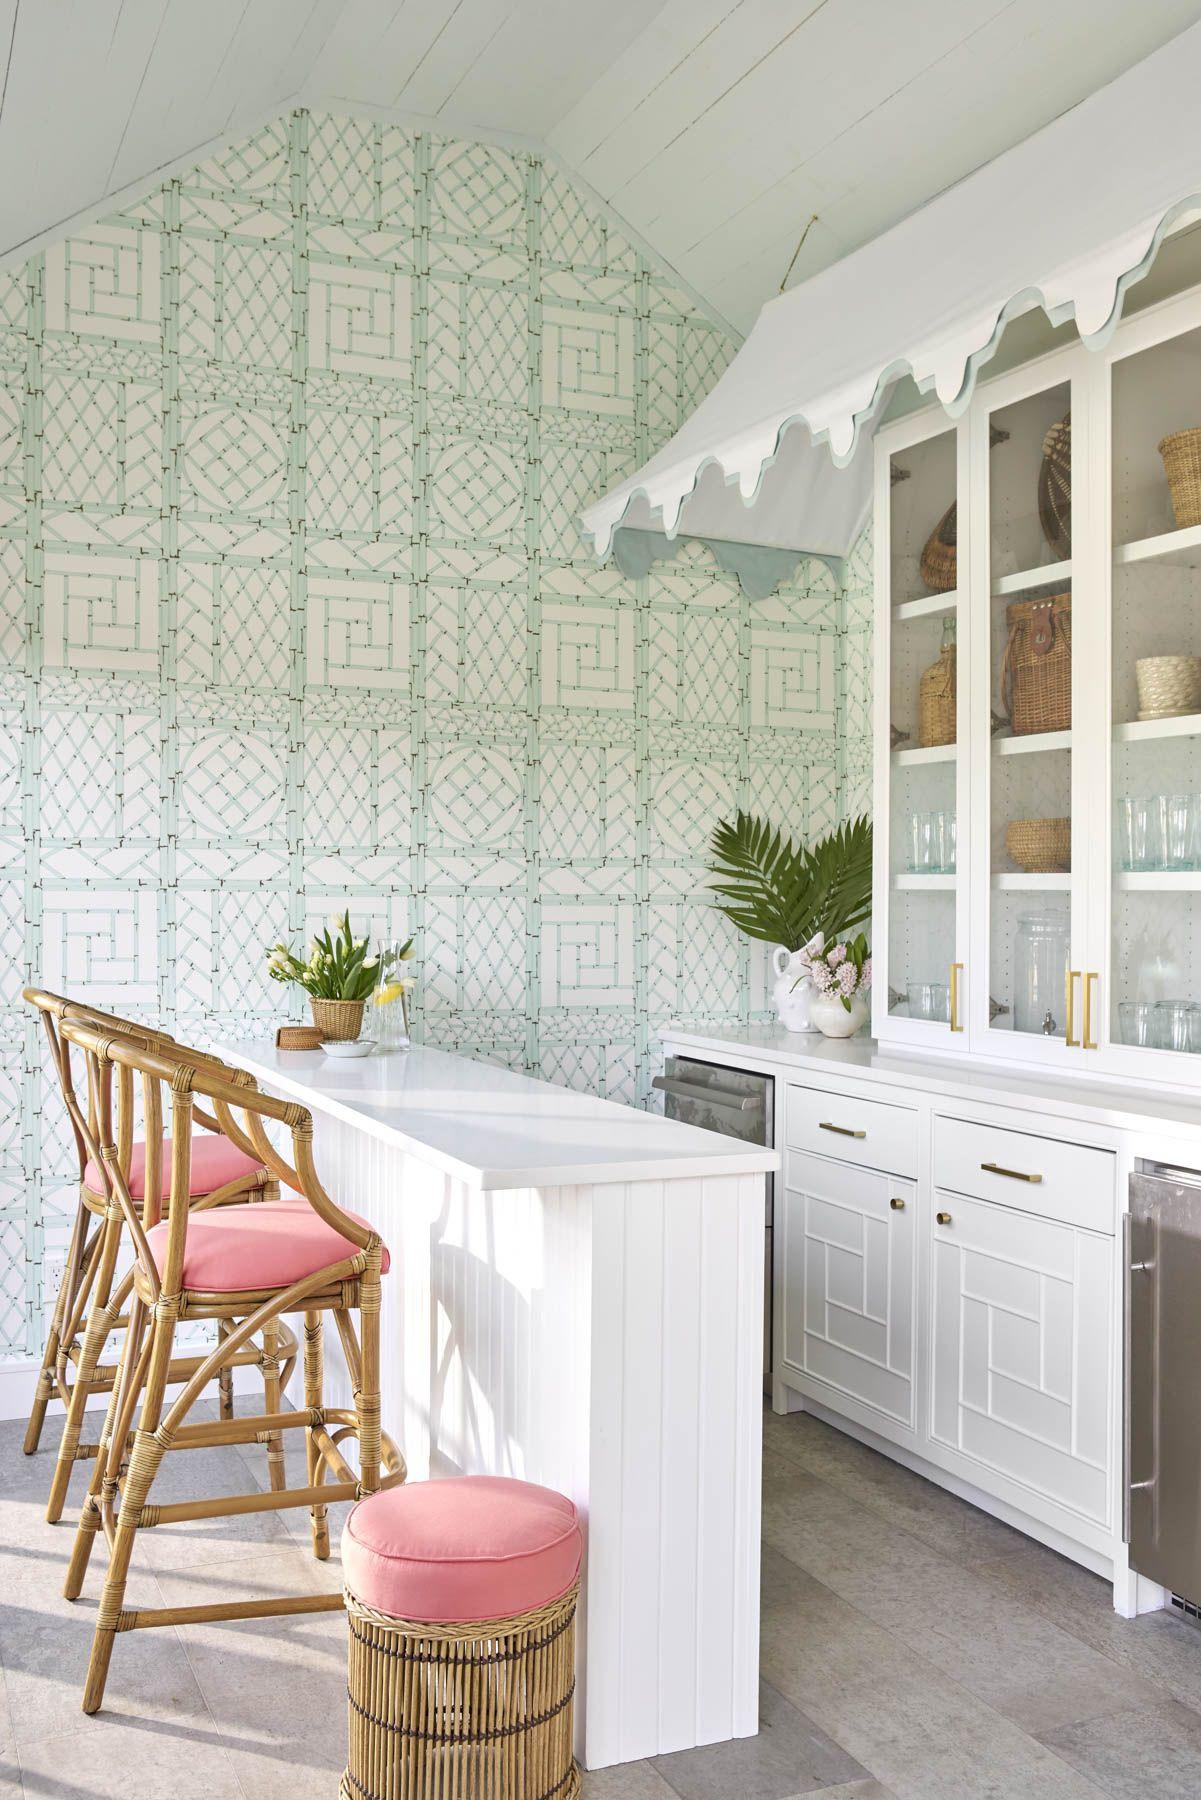 Amagansett Amy Berry Design Pool House Interiors House